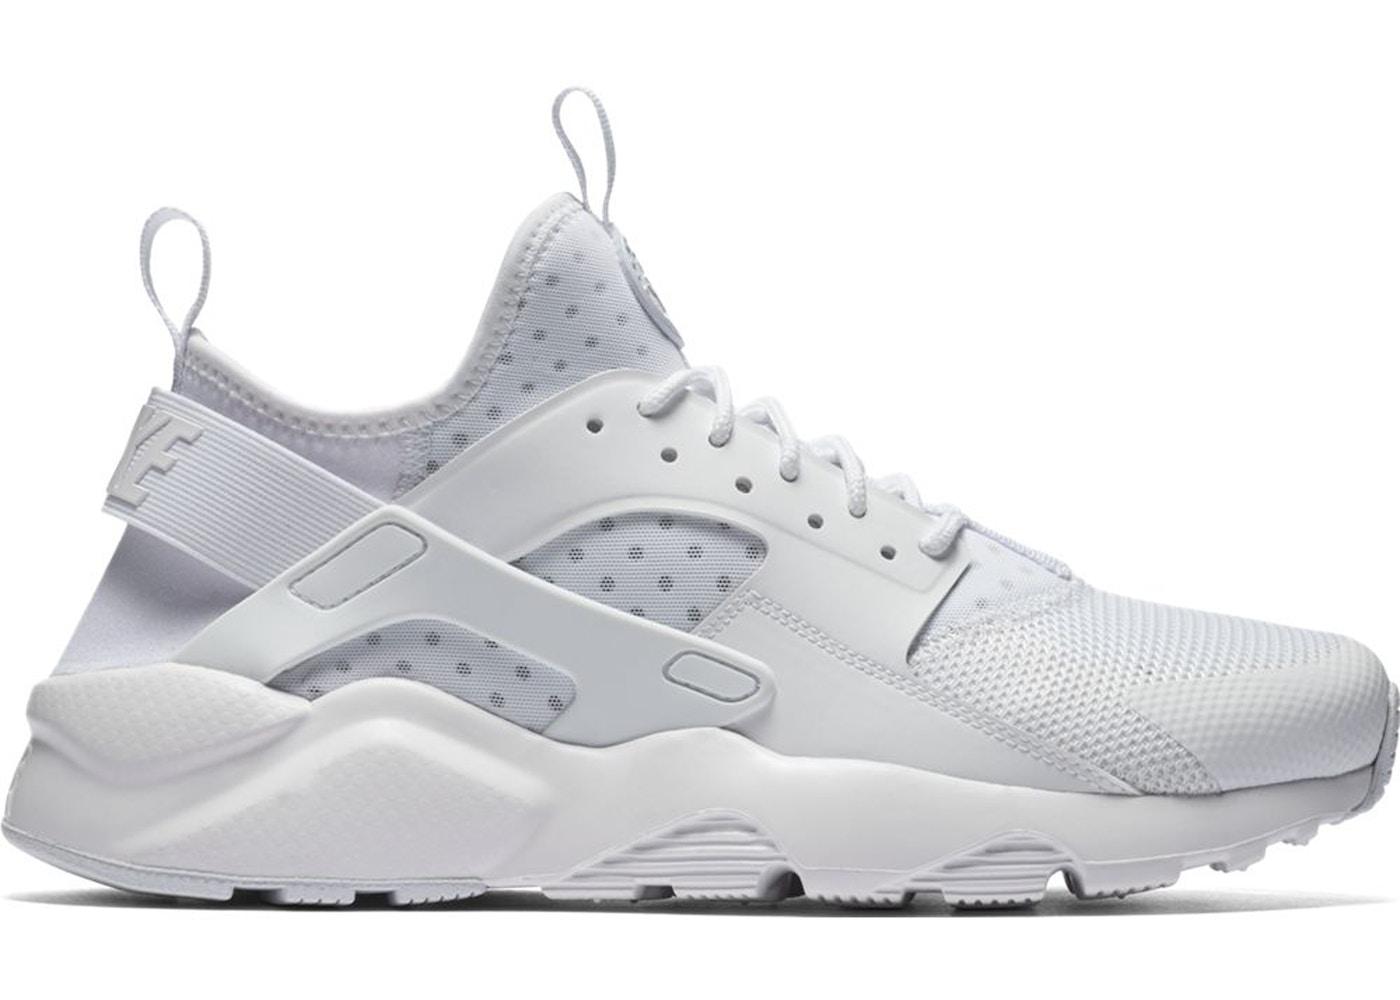 sector Pef Autocomplacencia  Nike Air Huarache Run Ultra White (2017) - 819685-101